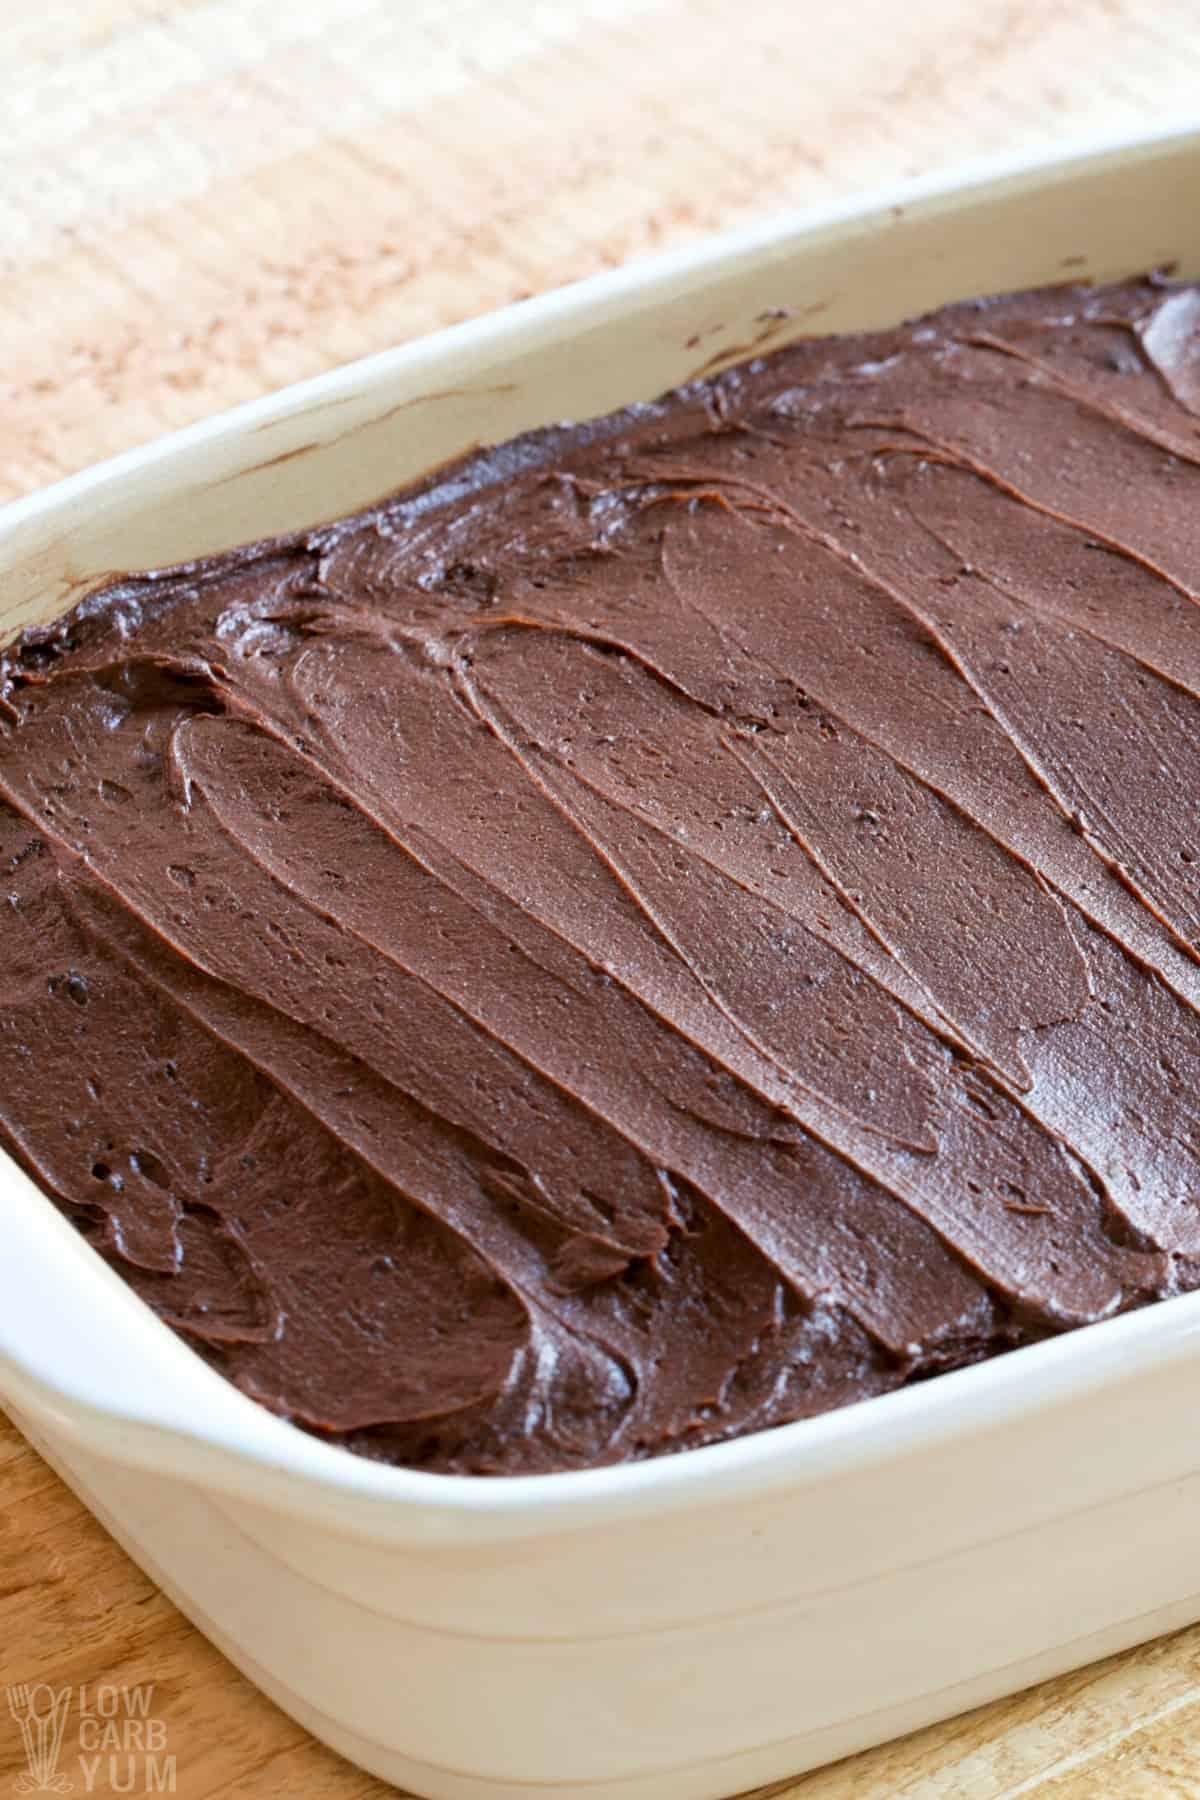 keto chocolate frosting on cake